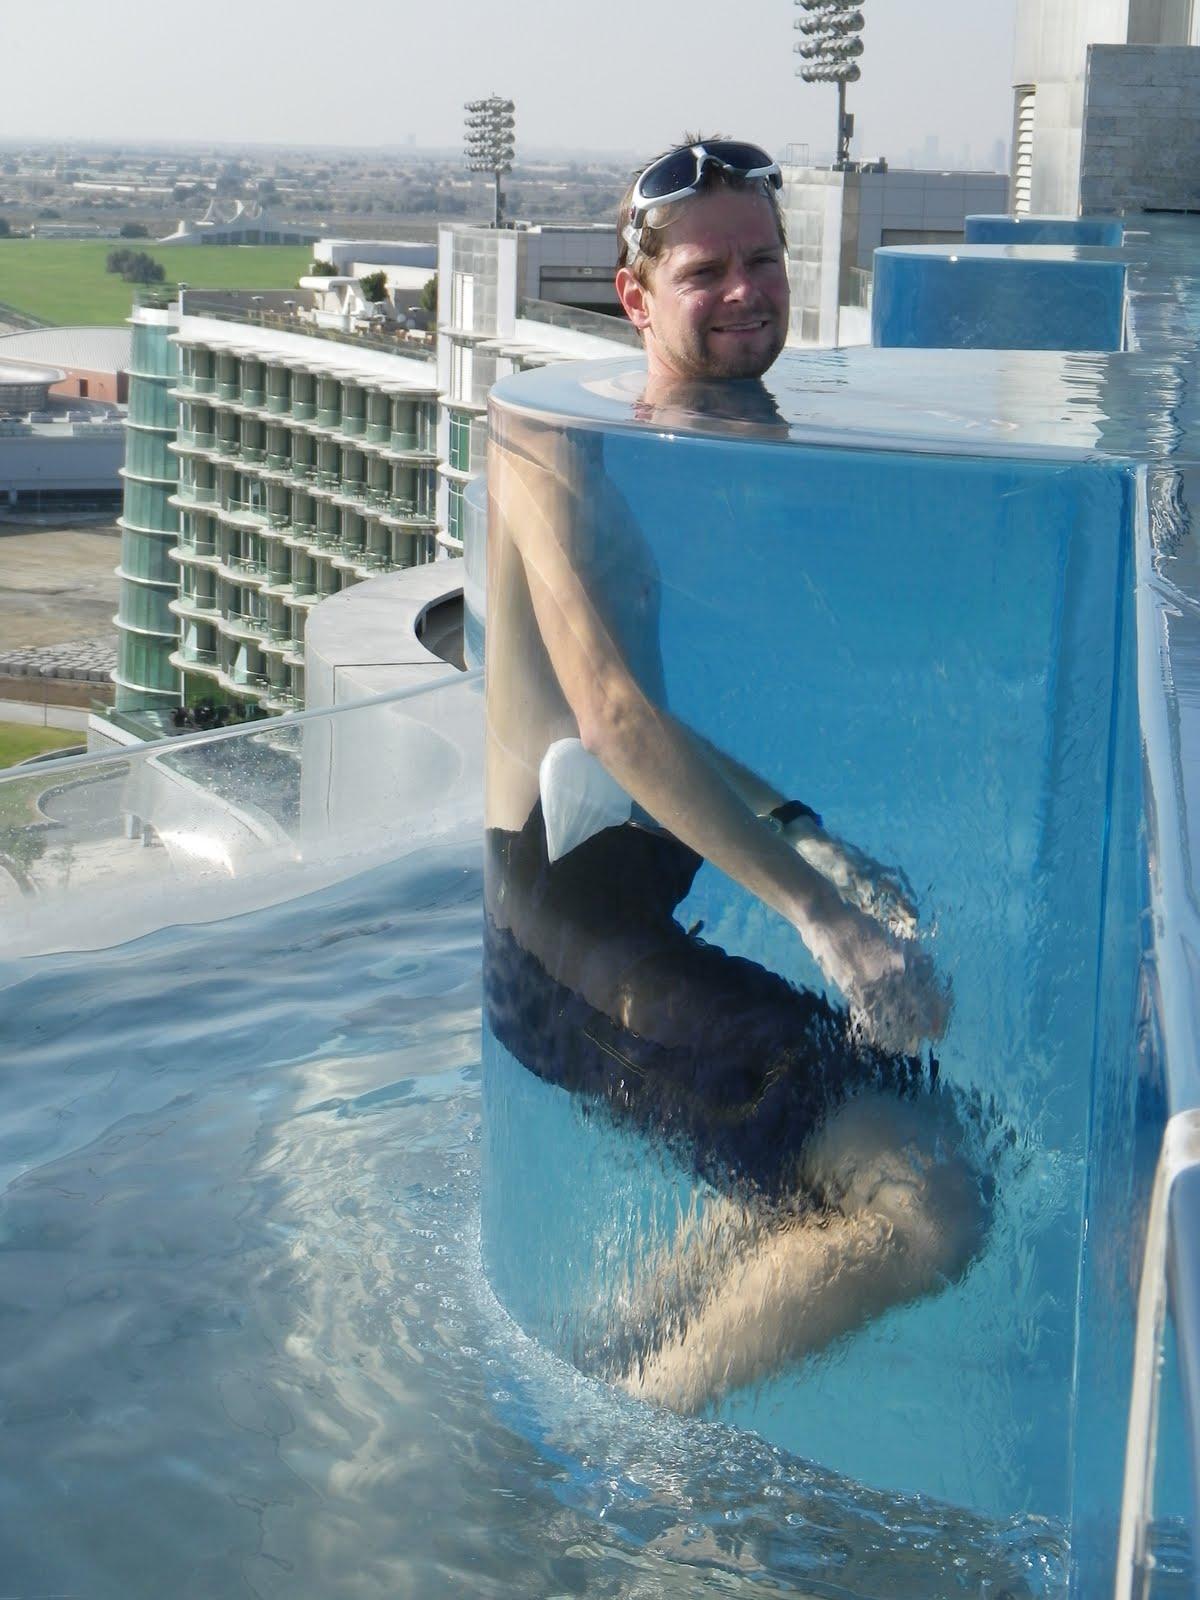 Yabba abu dhabi meydan hotel - Hotels in abu dhabi with swimming pool ...